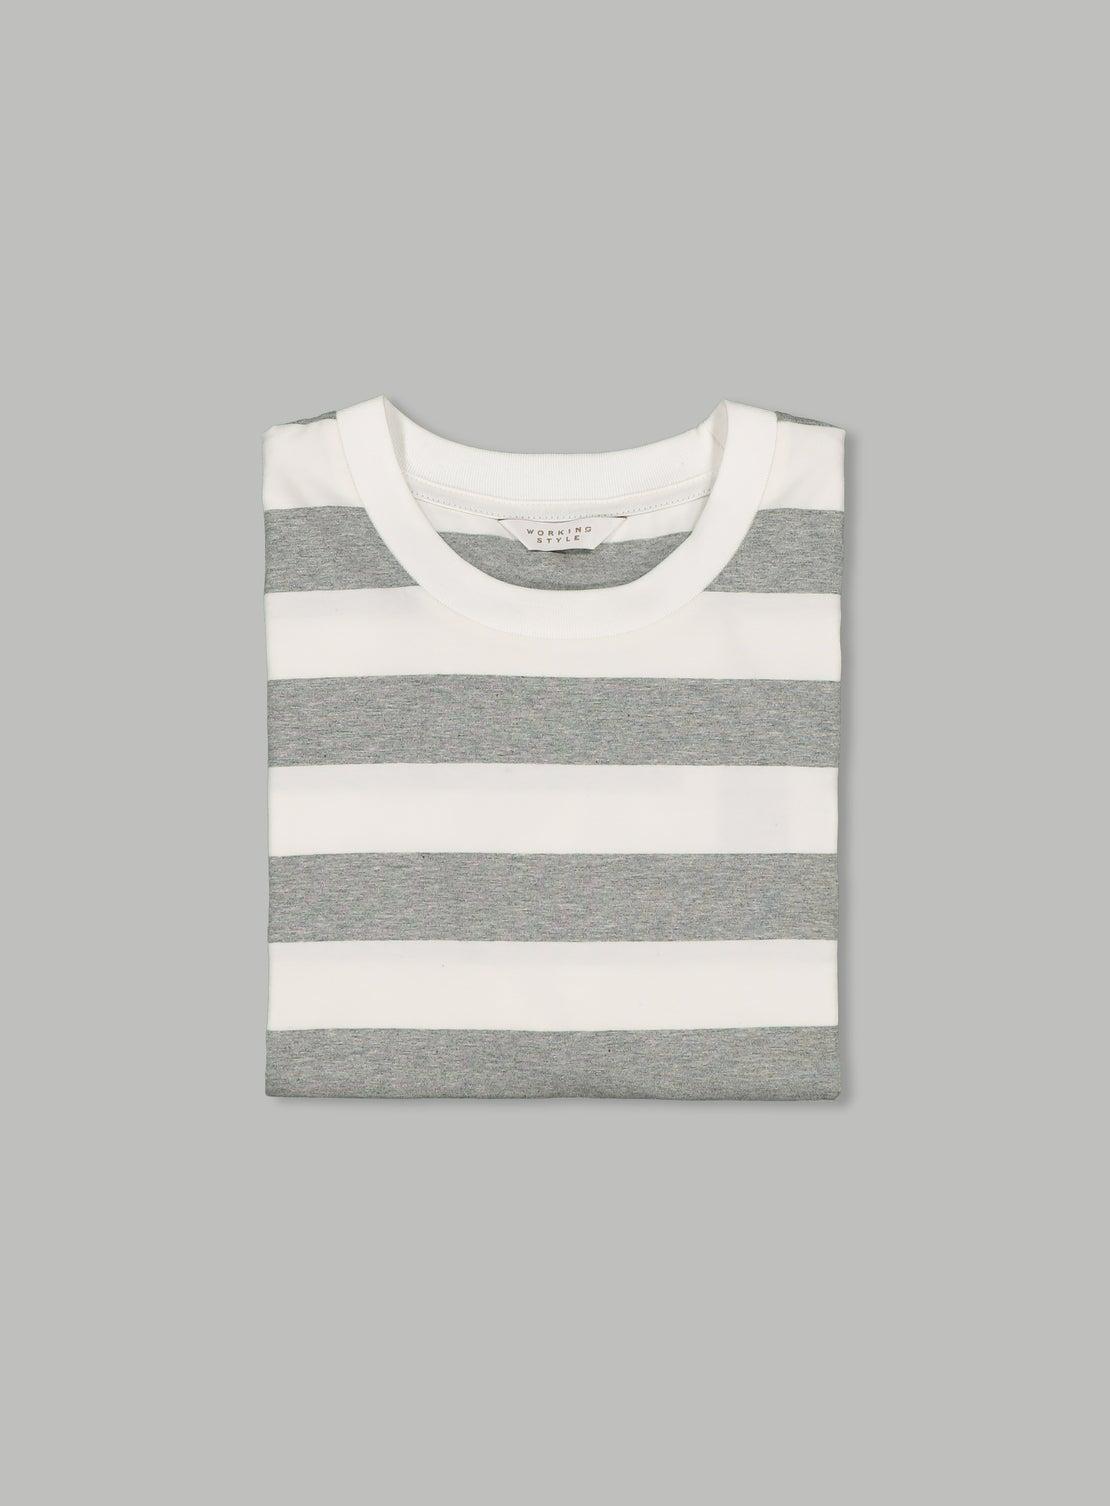 Donny Grey & White Wide Stripe Tee